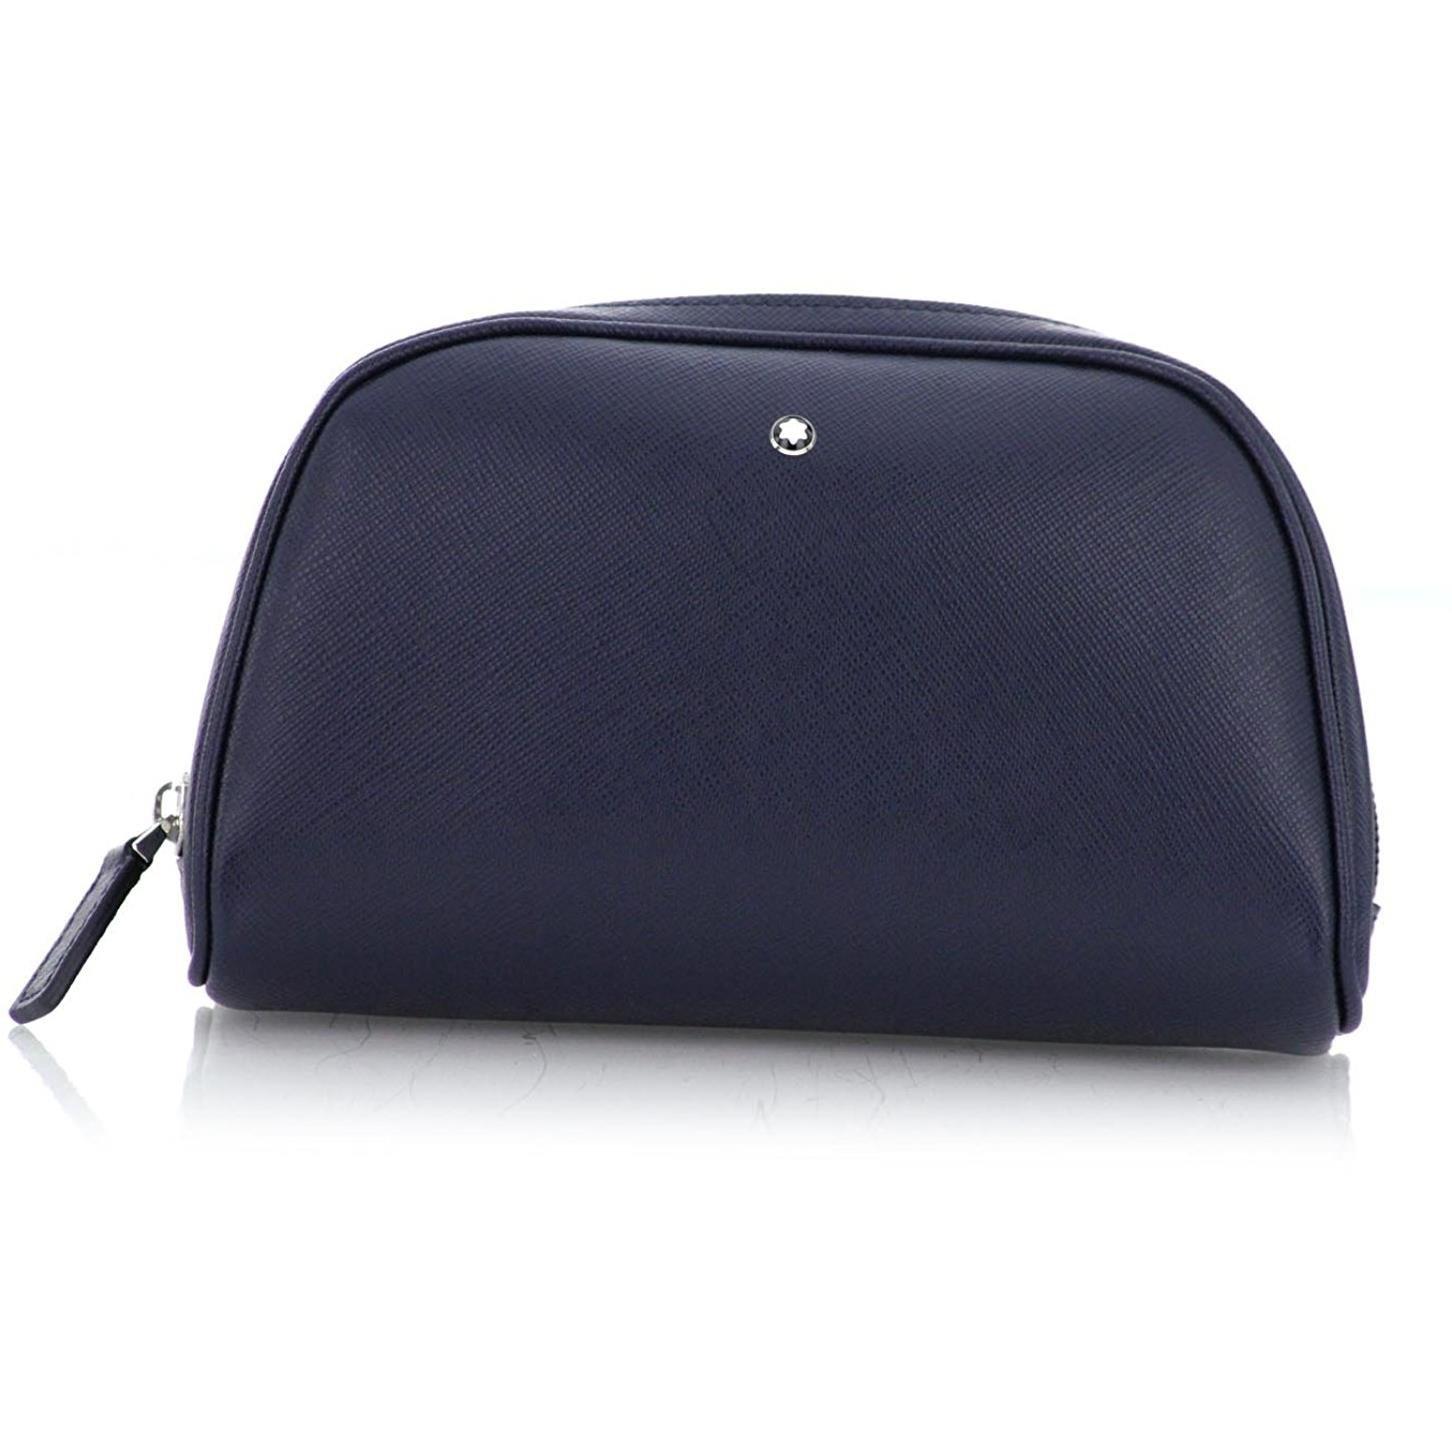 Montblanc 116762 Sartorial Vanity Bag Large